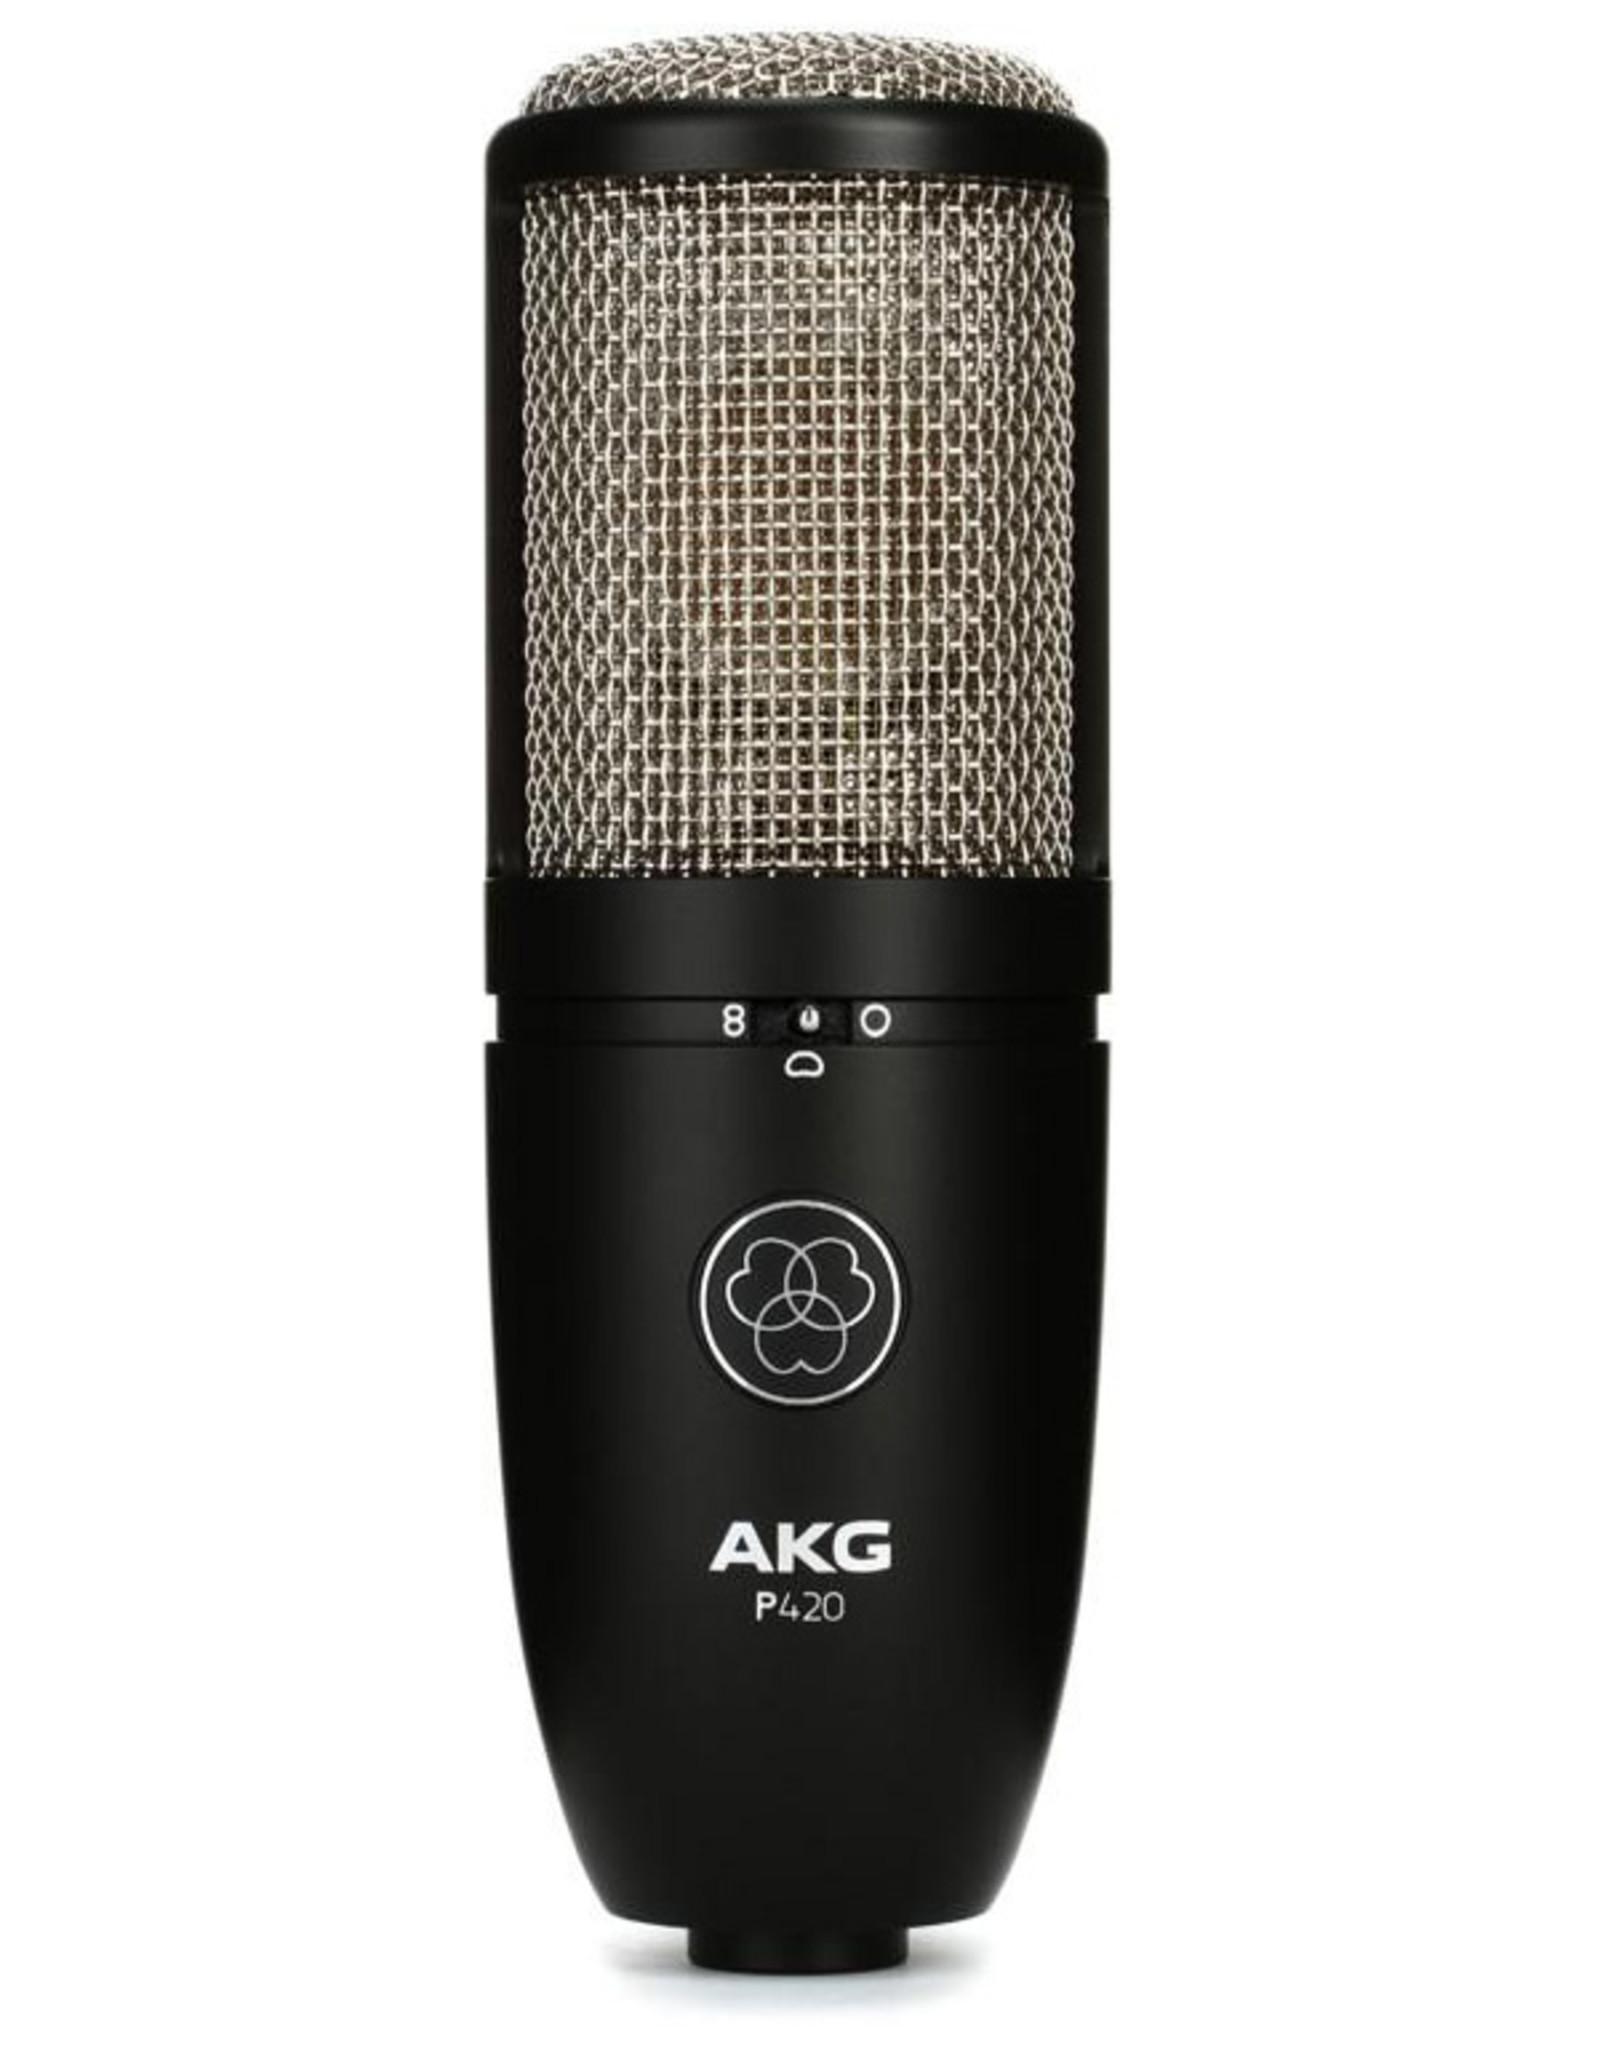 AKG AKG P420 High Perfomance Dual Capsule True Condenser Microphone